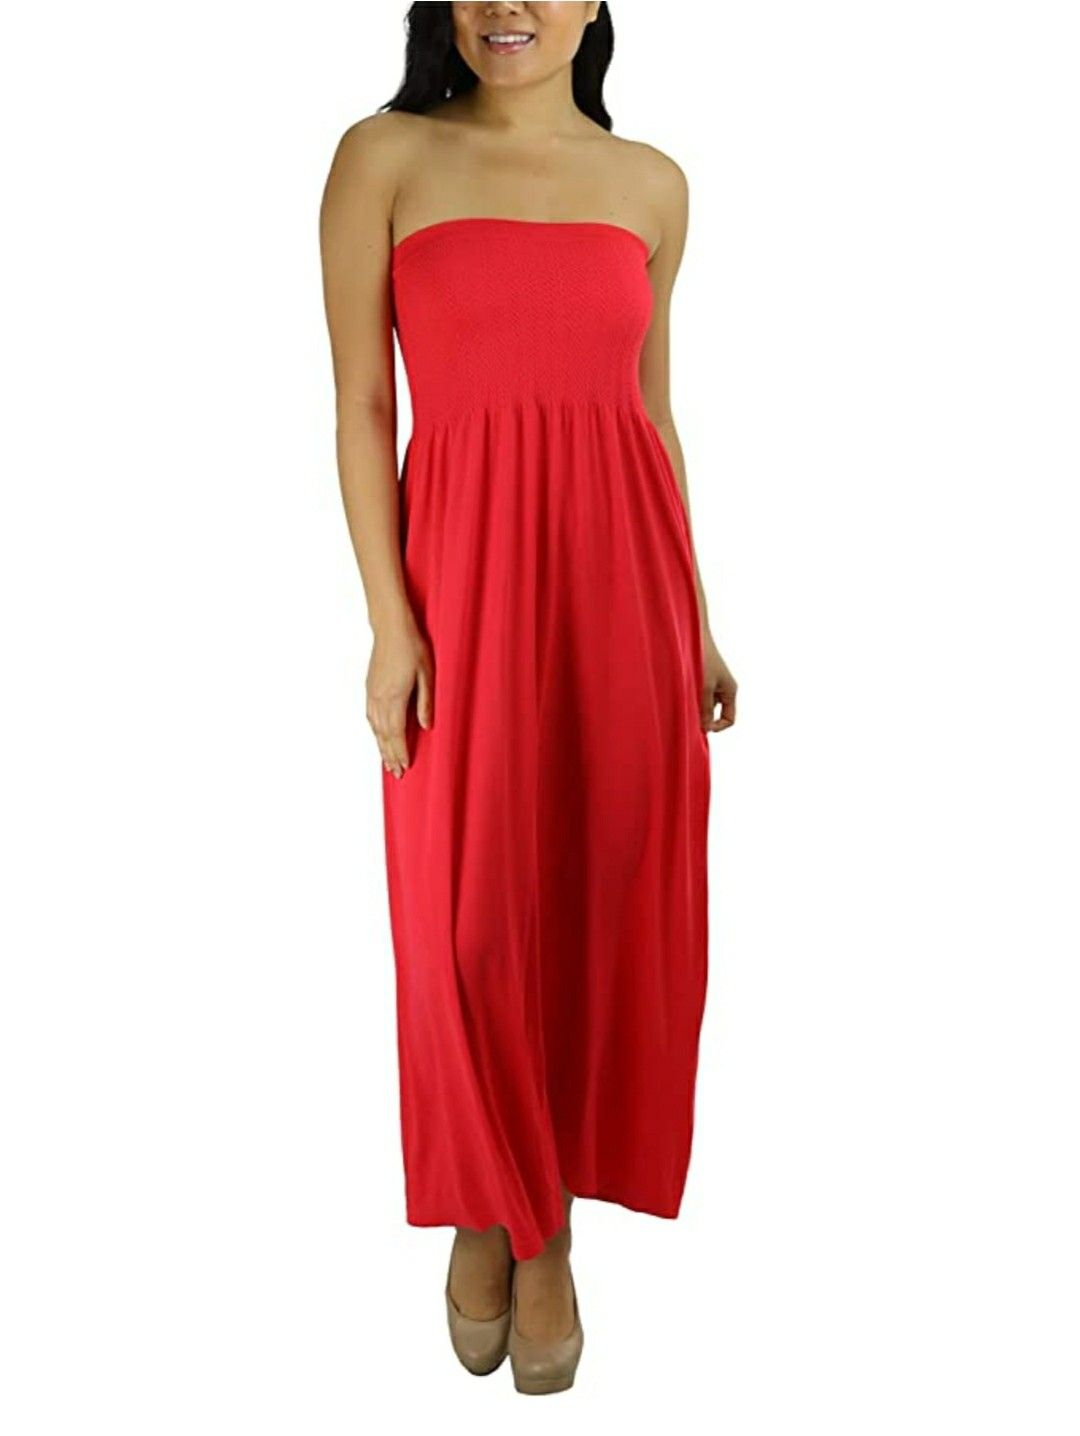 Tobeinstyle Women S Summer Tube Top Mini Dress Tube Dress Dresses Mini Tube Dress [ 1436 x 1080 Pixel ]